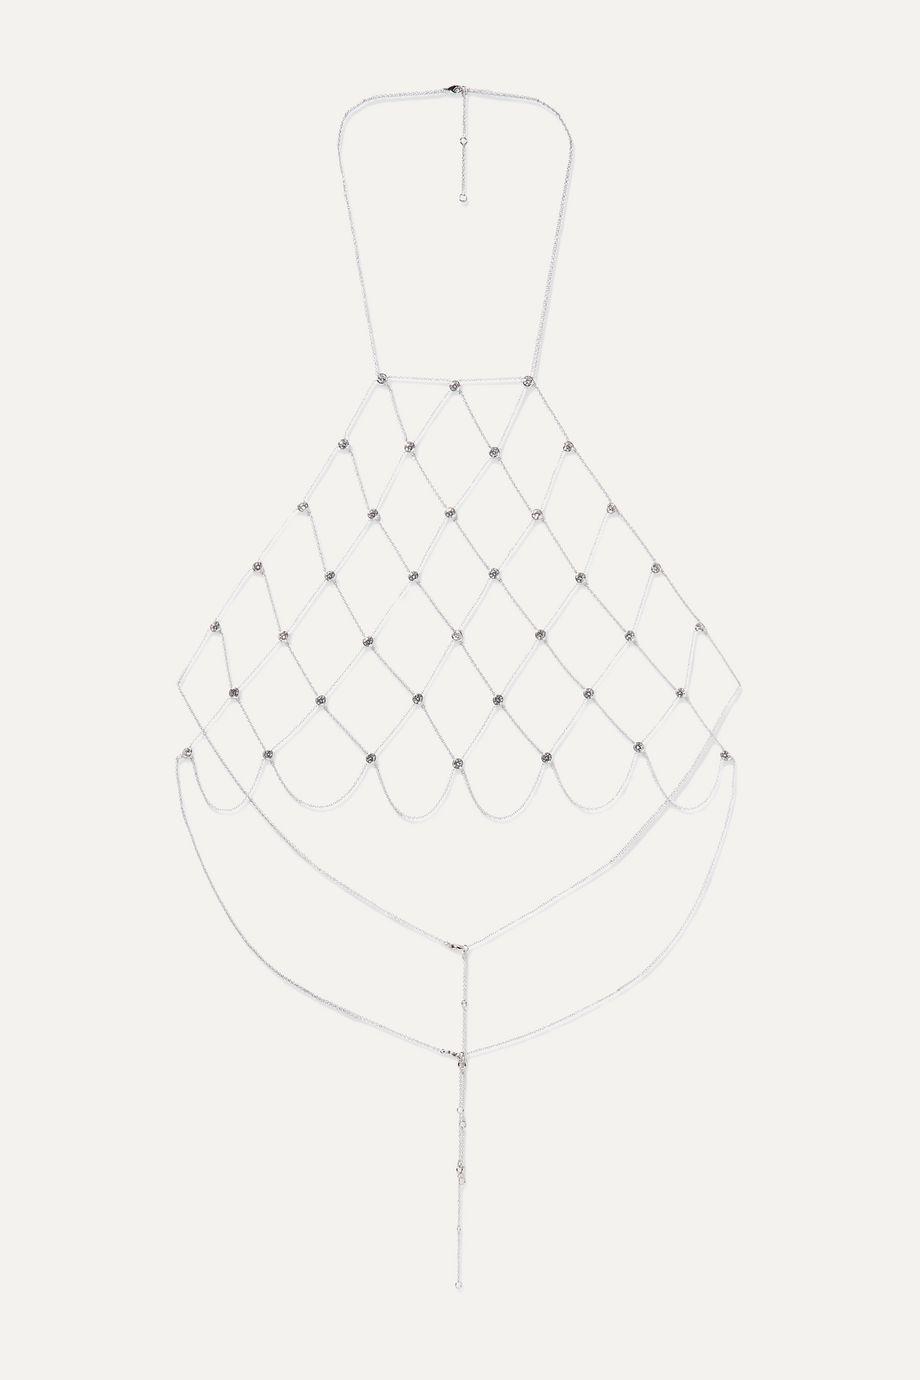 Kenneth Jay Lane Silver-tone cubic zirconia body chain